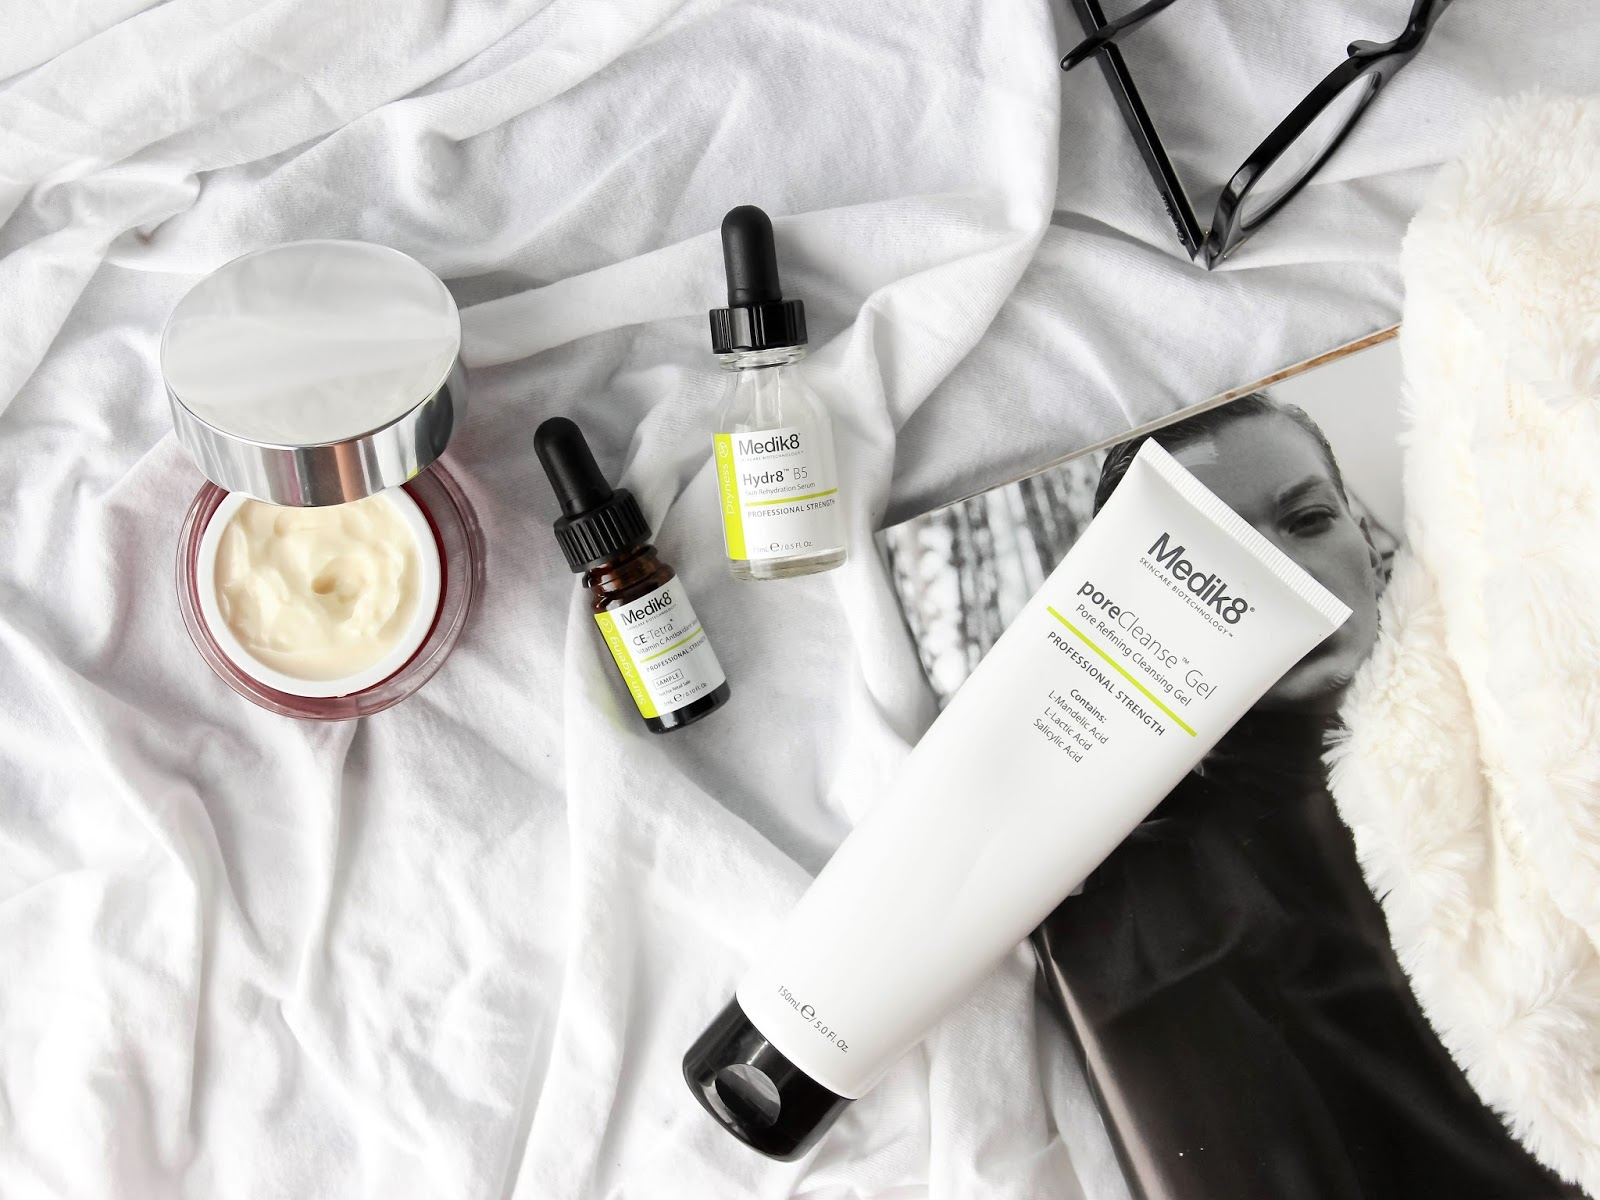 medic8 pore cleans gel recenze